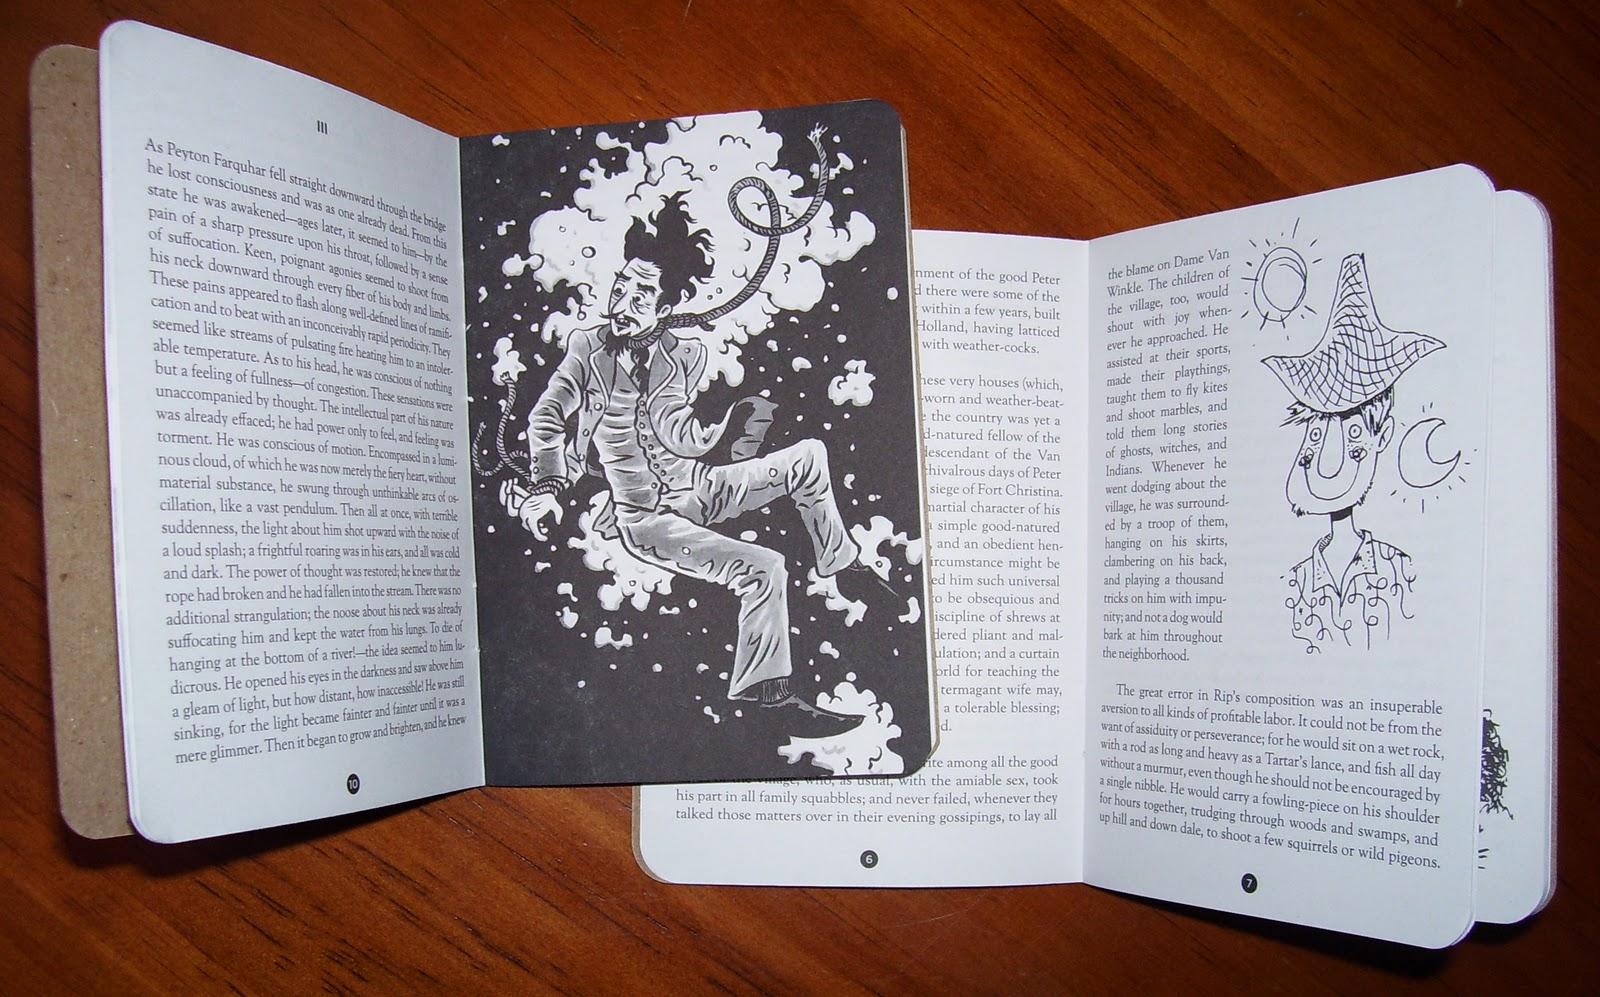 Ambrose Bierce, Illustrated By Francois Vigneault; Washington Irving  Illustrated By Bwana Spoons